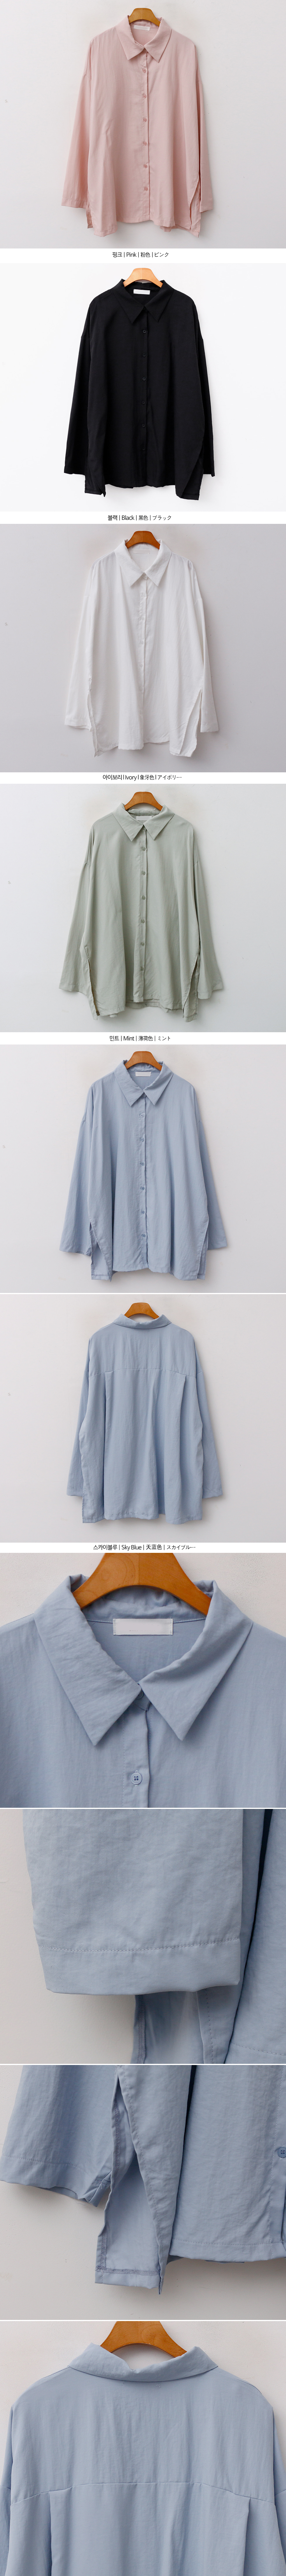 Muse Deep Slit Shirt